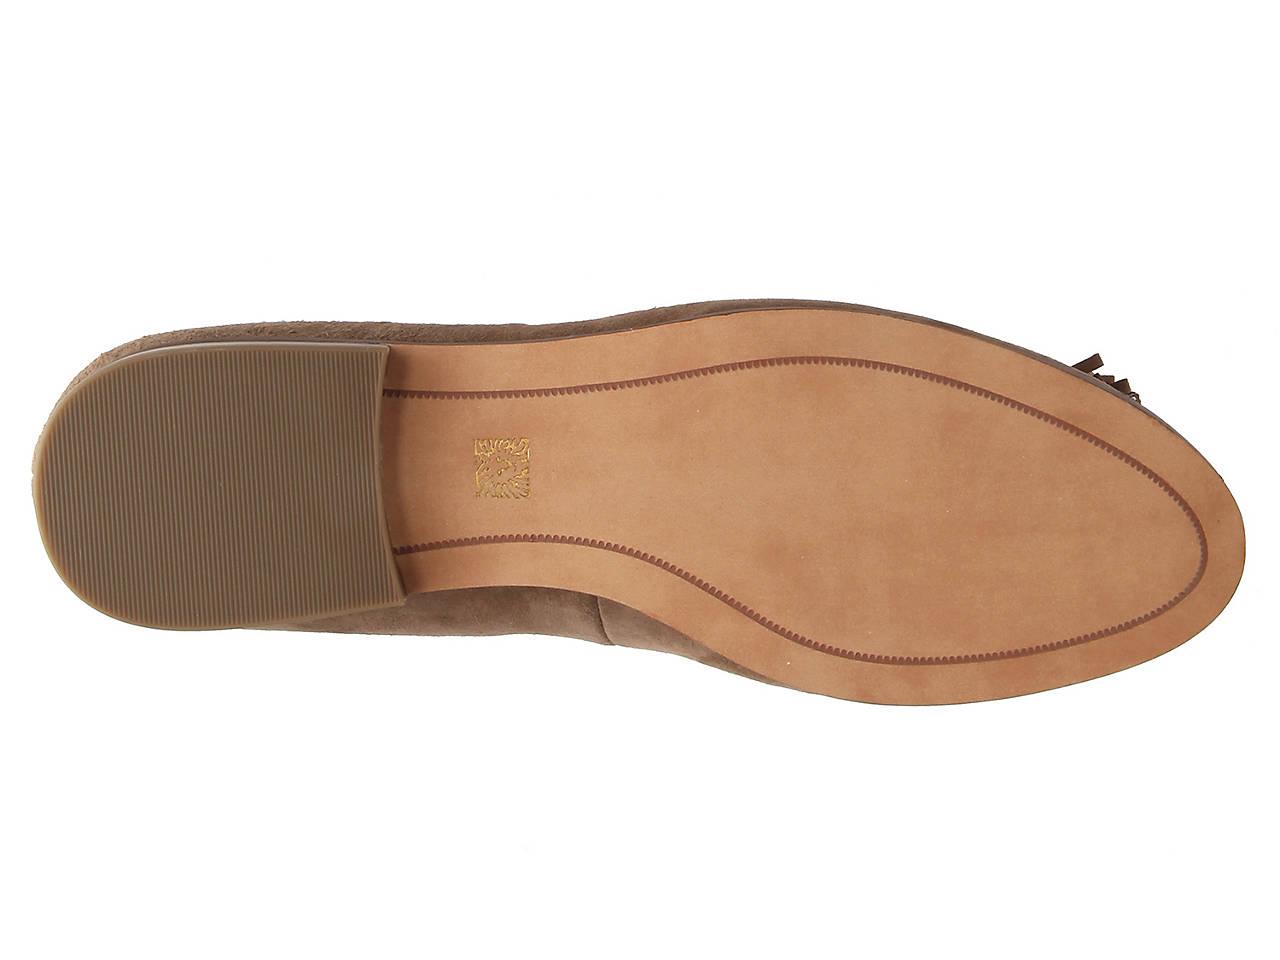 e960de0b032 Anne Klein Darcey Loafer Women s Shoes